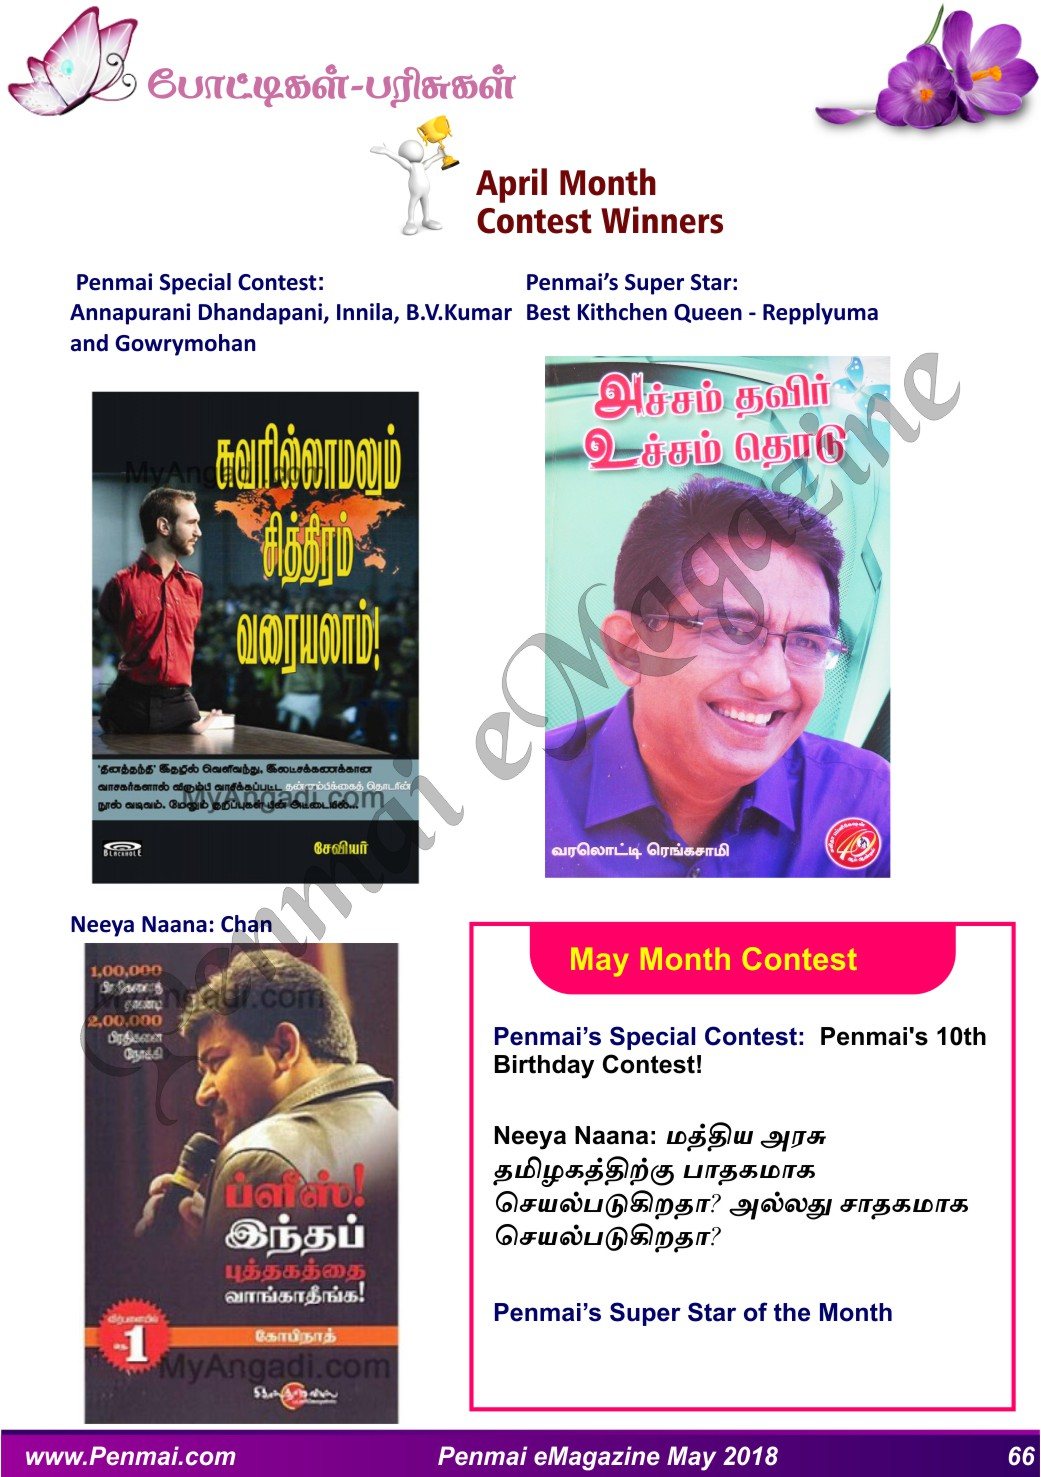 Penmai-eMagazine-May-2018-66.jpg